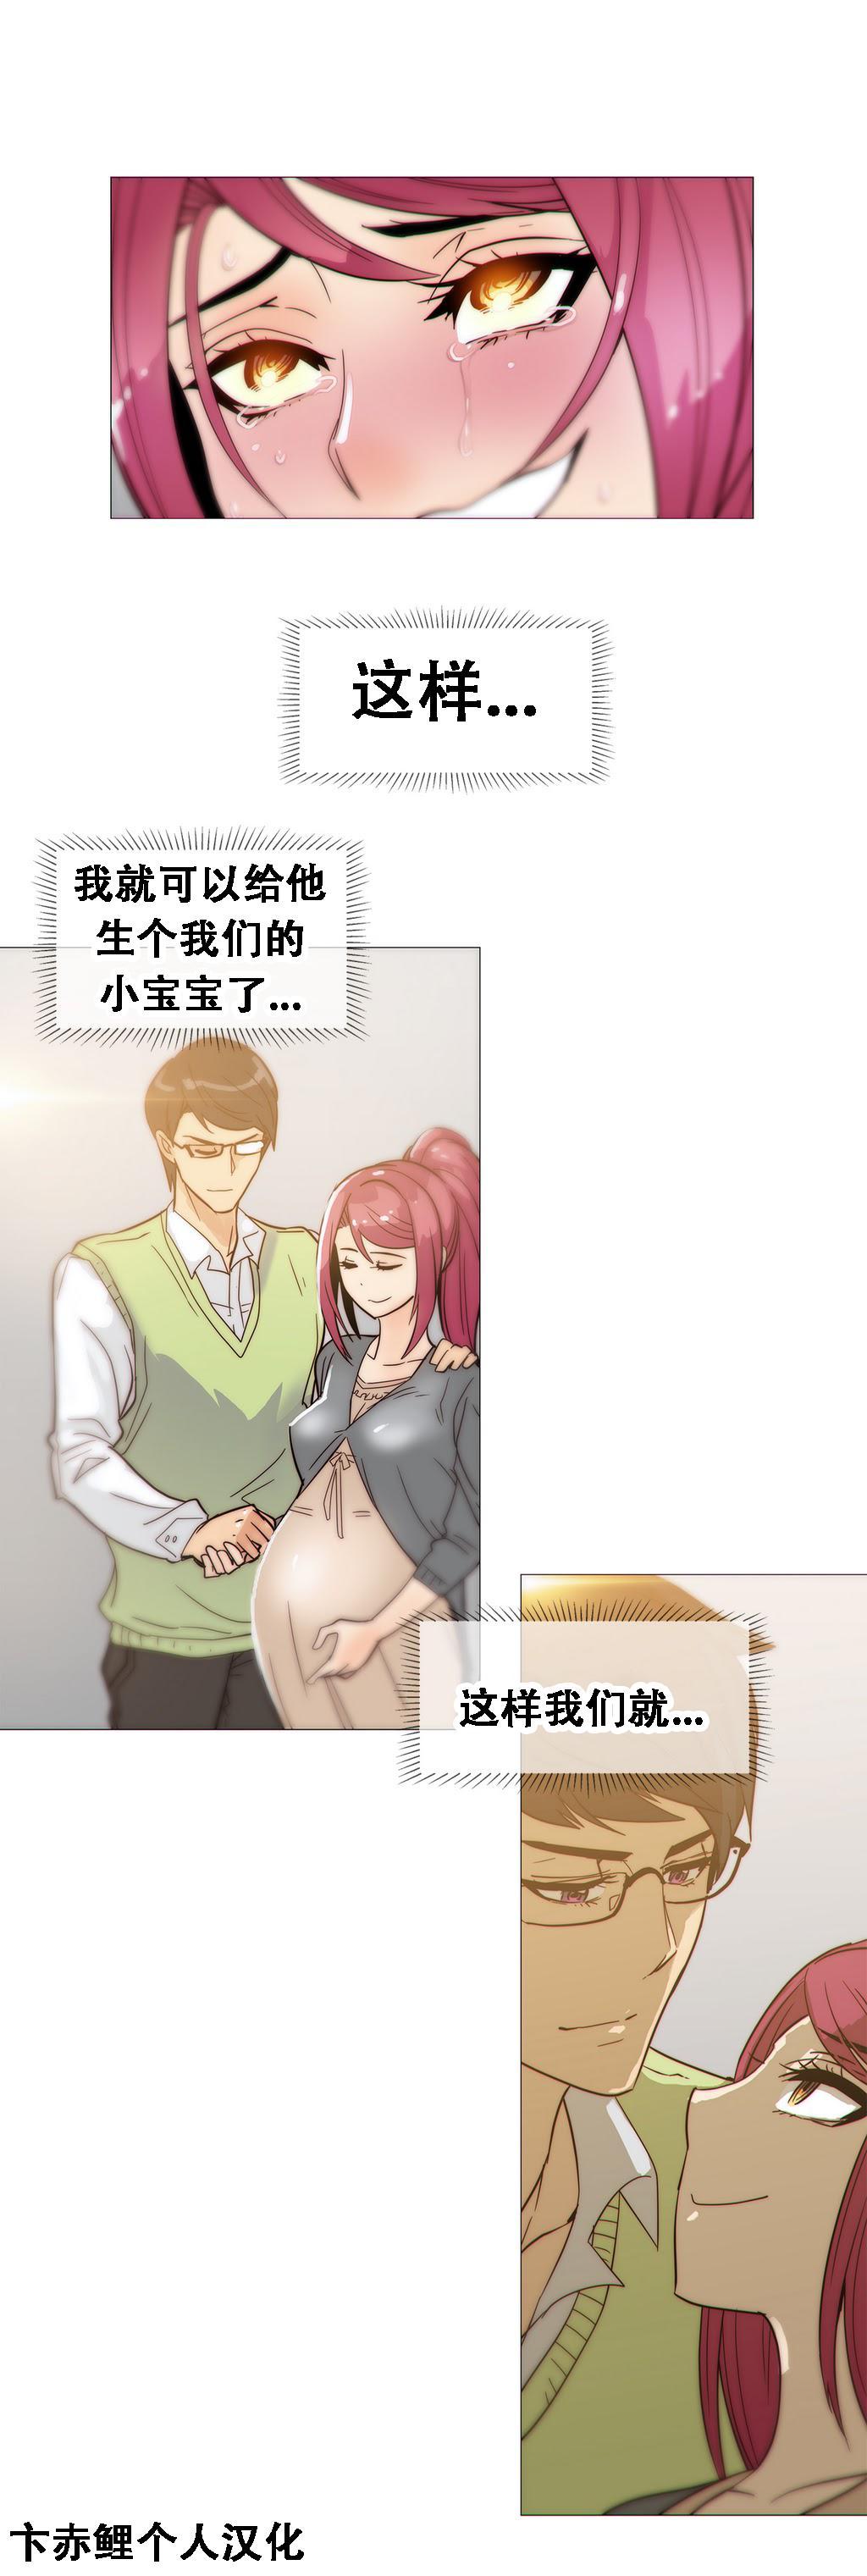 HouseHold Affairs 【卞赤鲤个人汉化】1~21话(持续更新中) 434